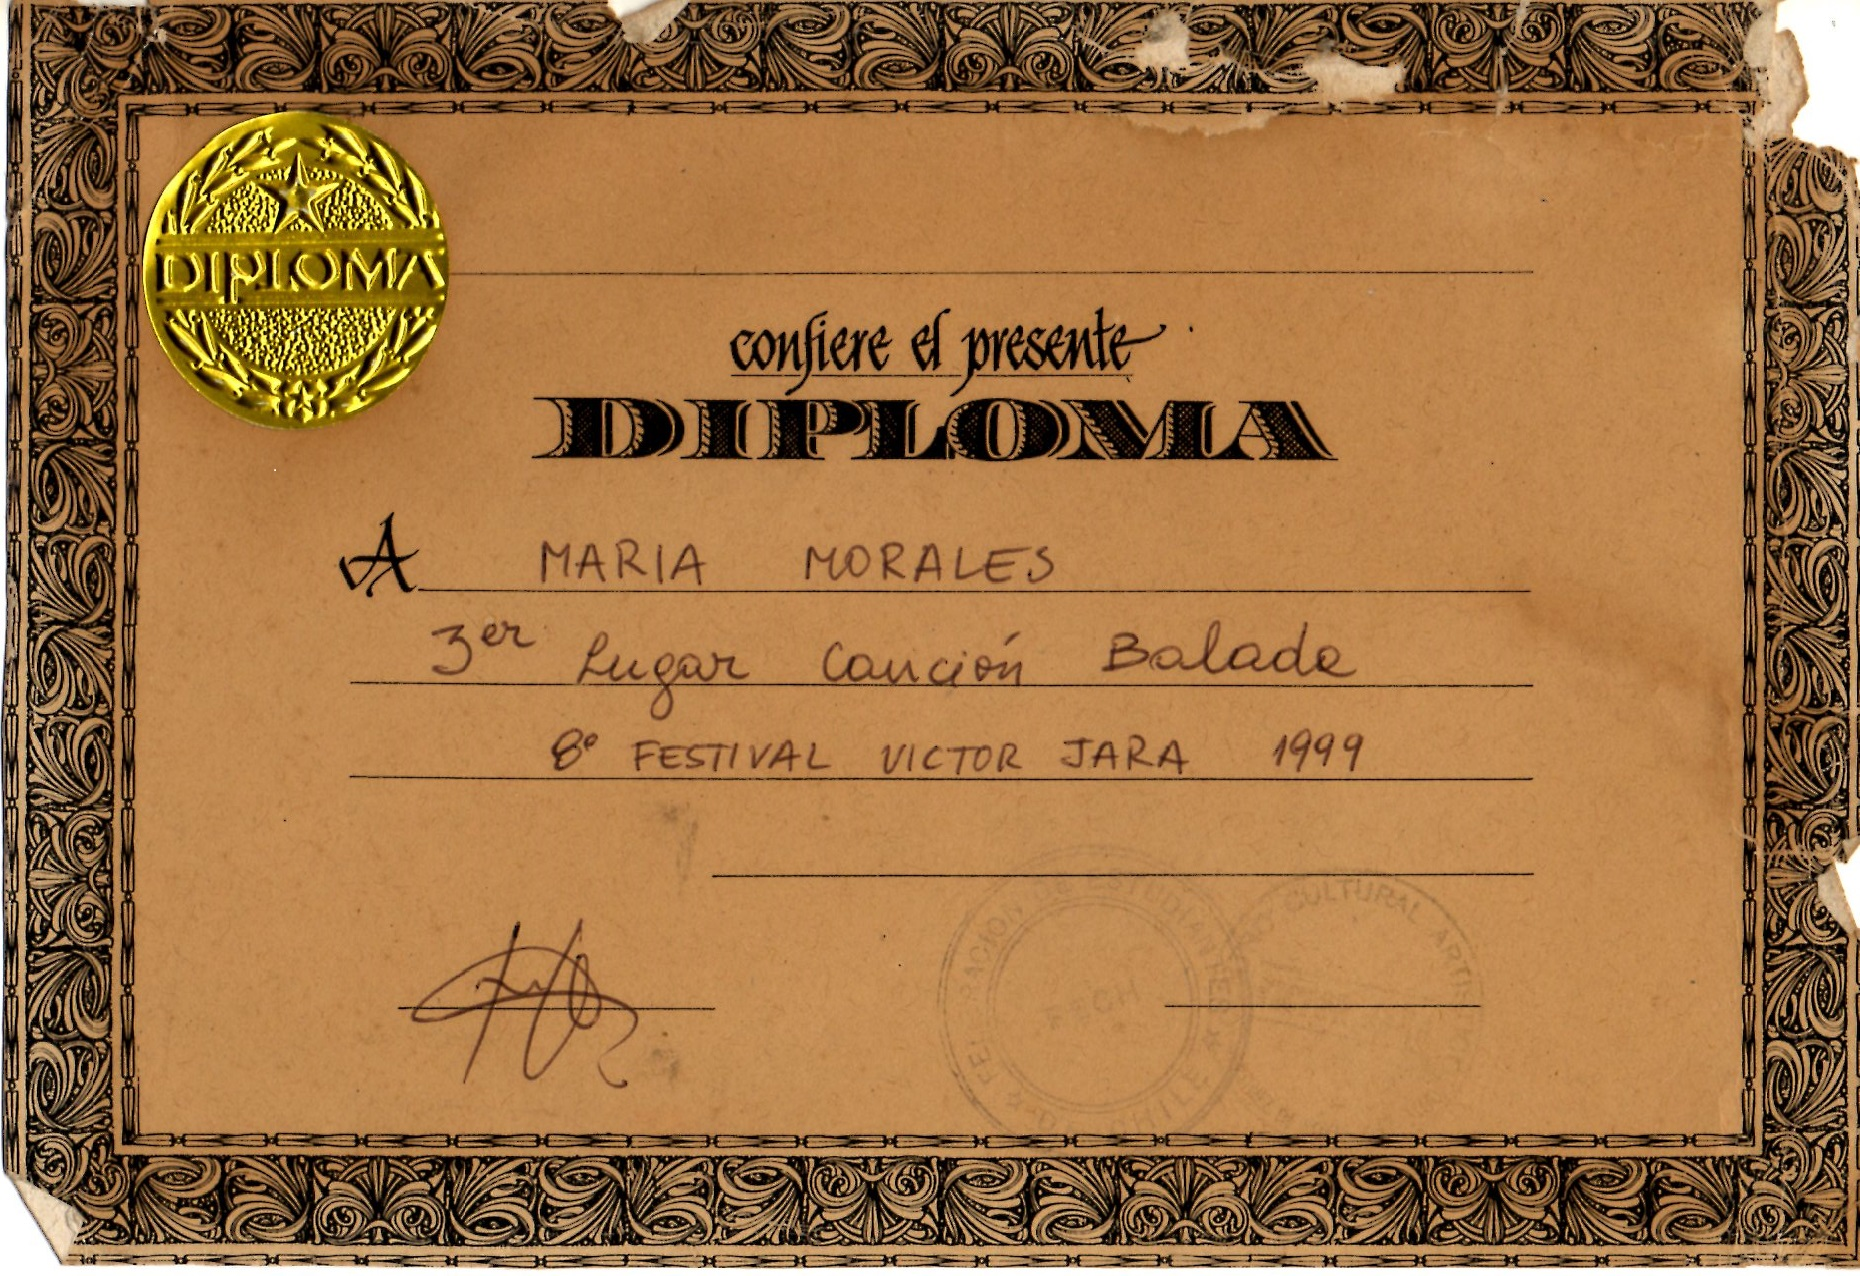 Festival Victor Jara.jpg